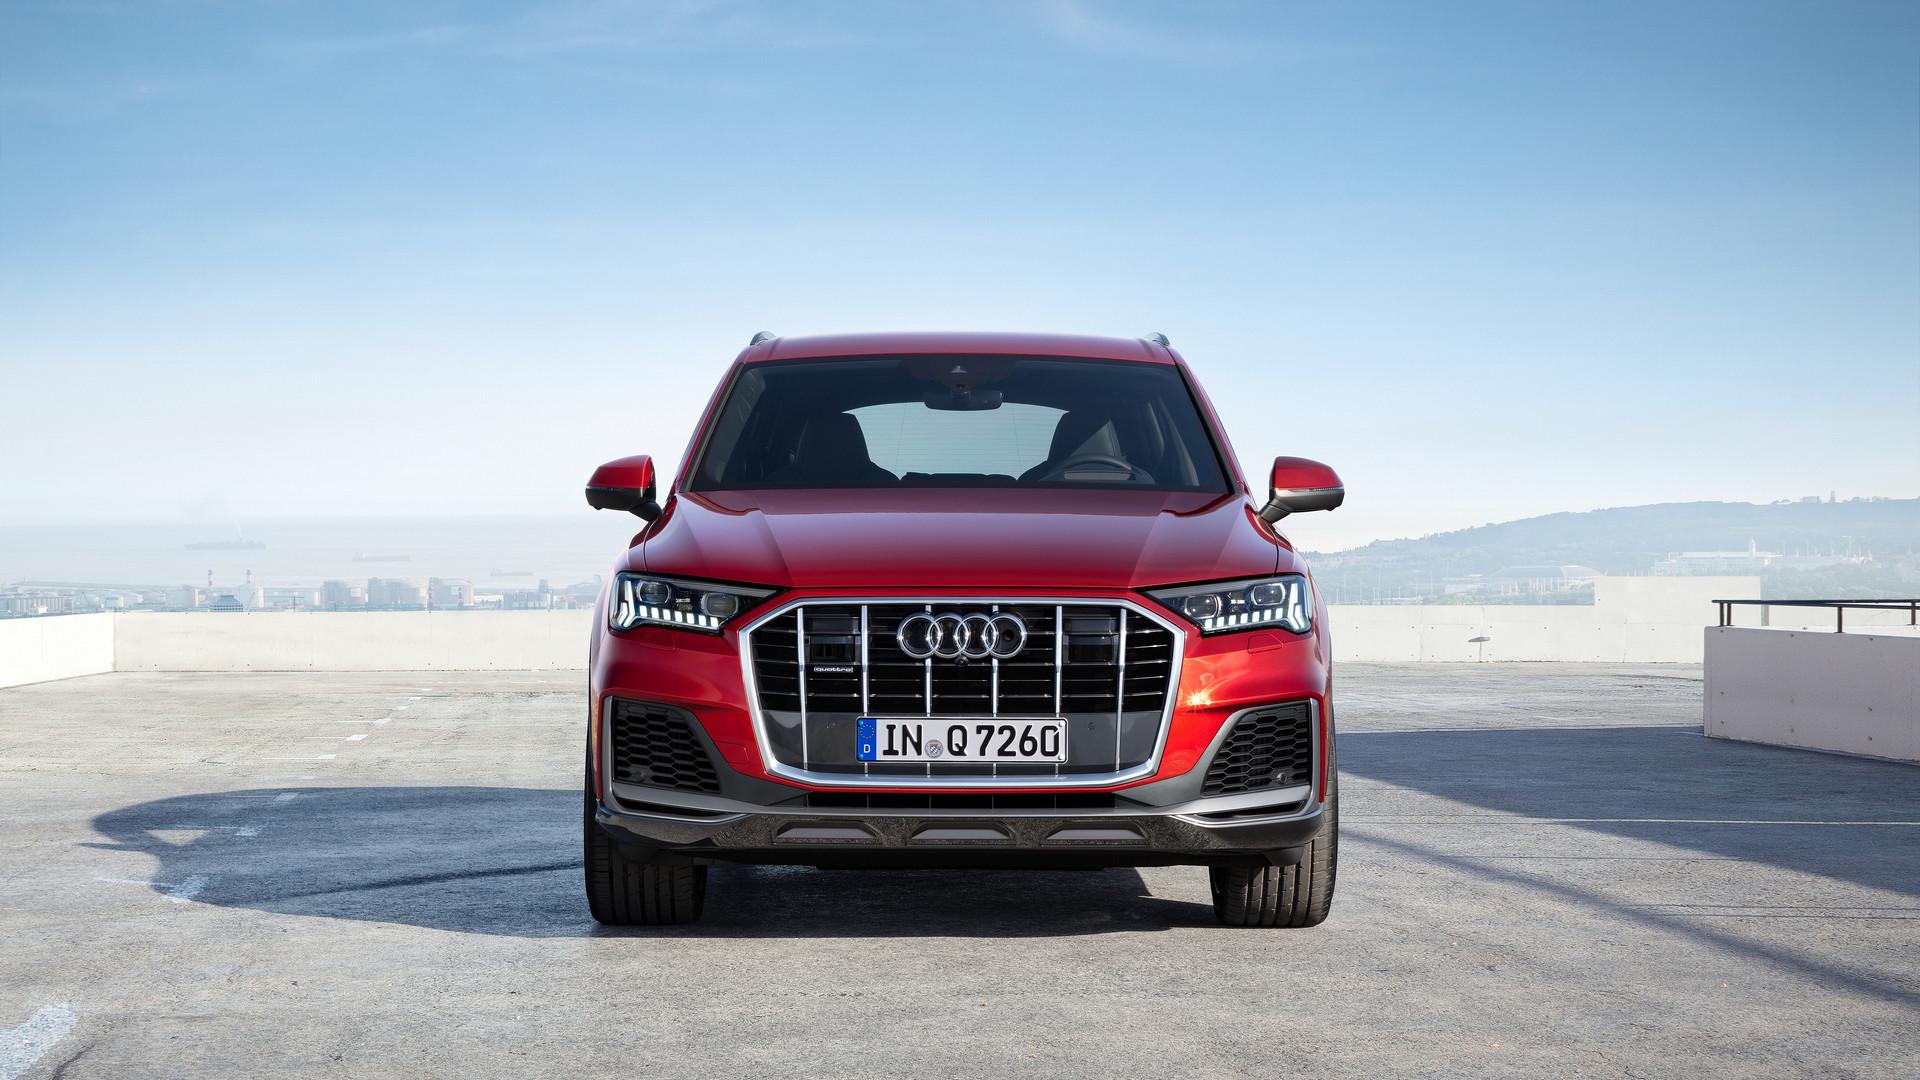 2020 Audi Q7 Review.2020 Audi Q7 Facelift Review Gtspirit